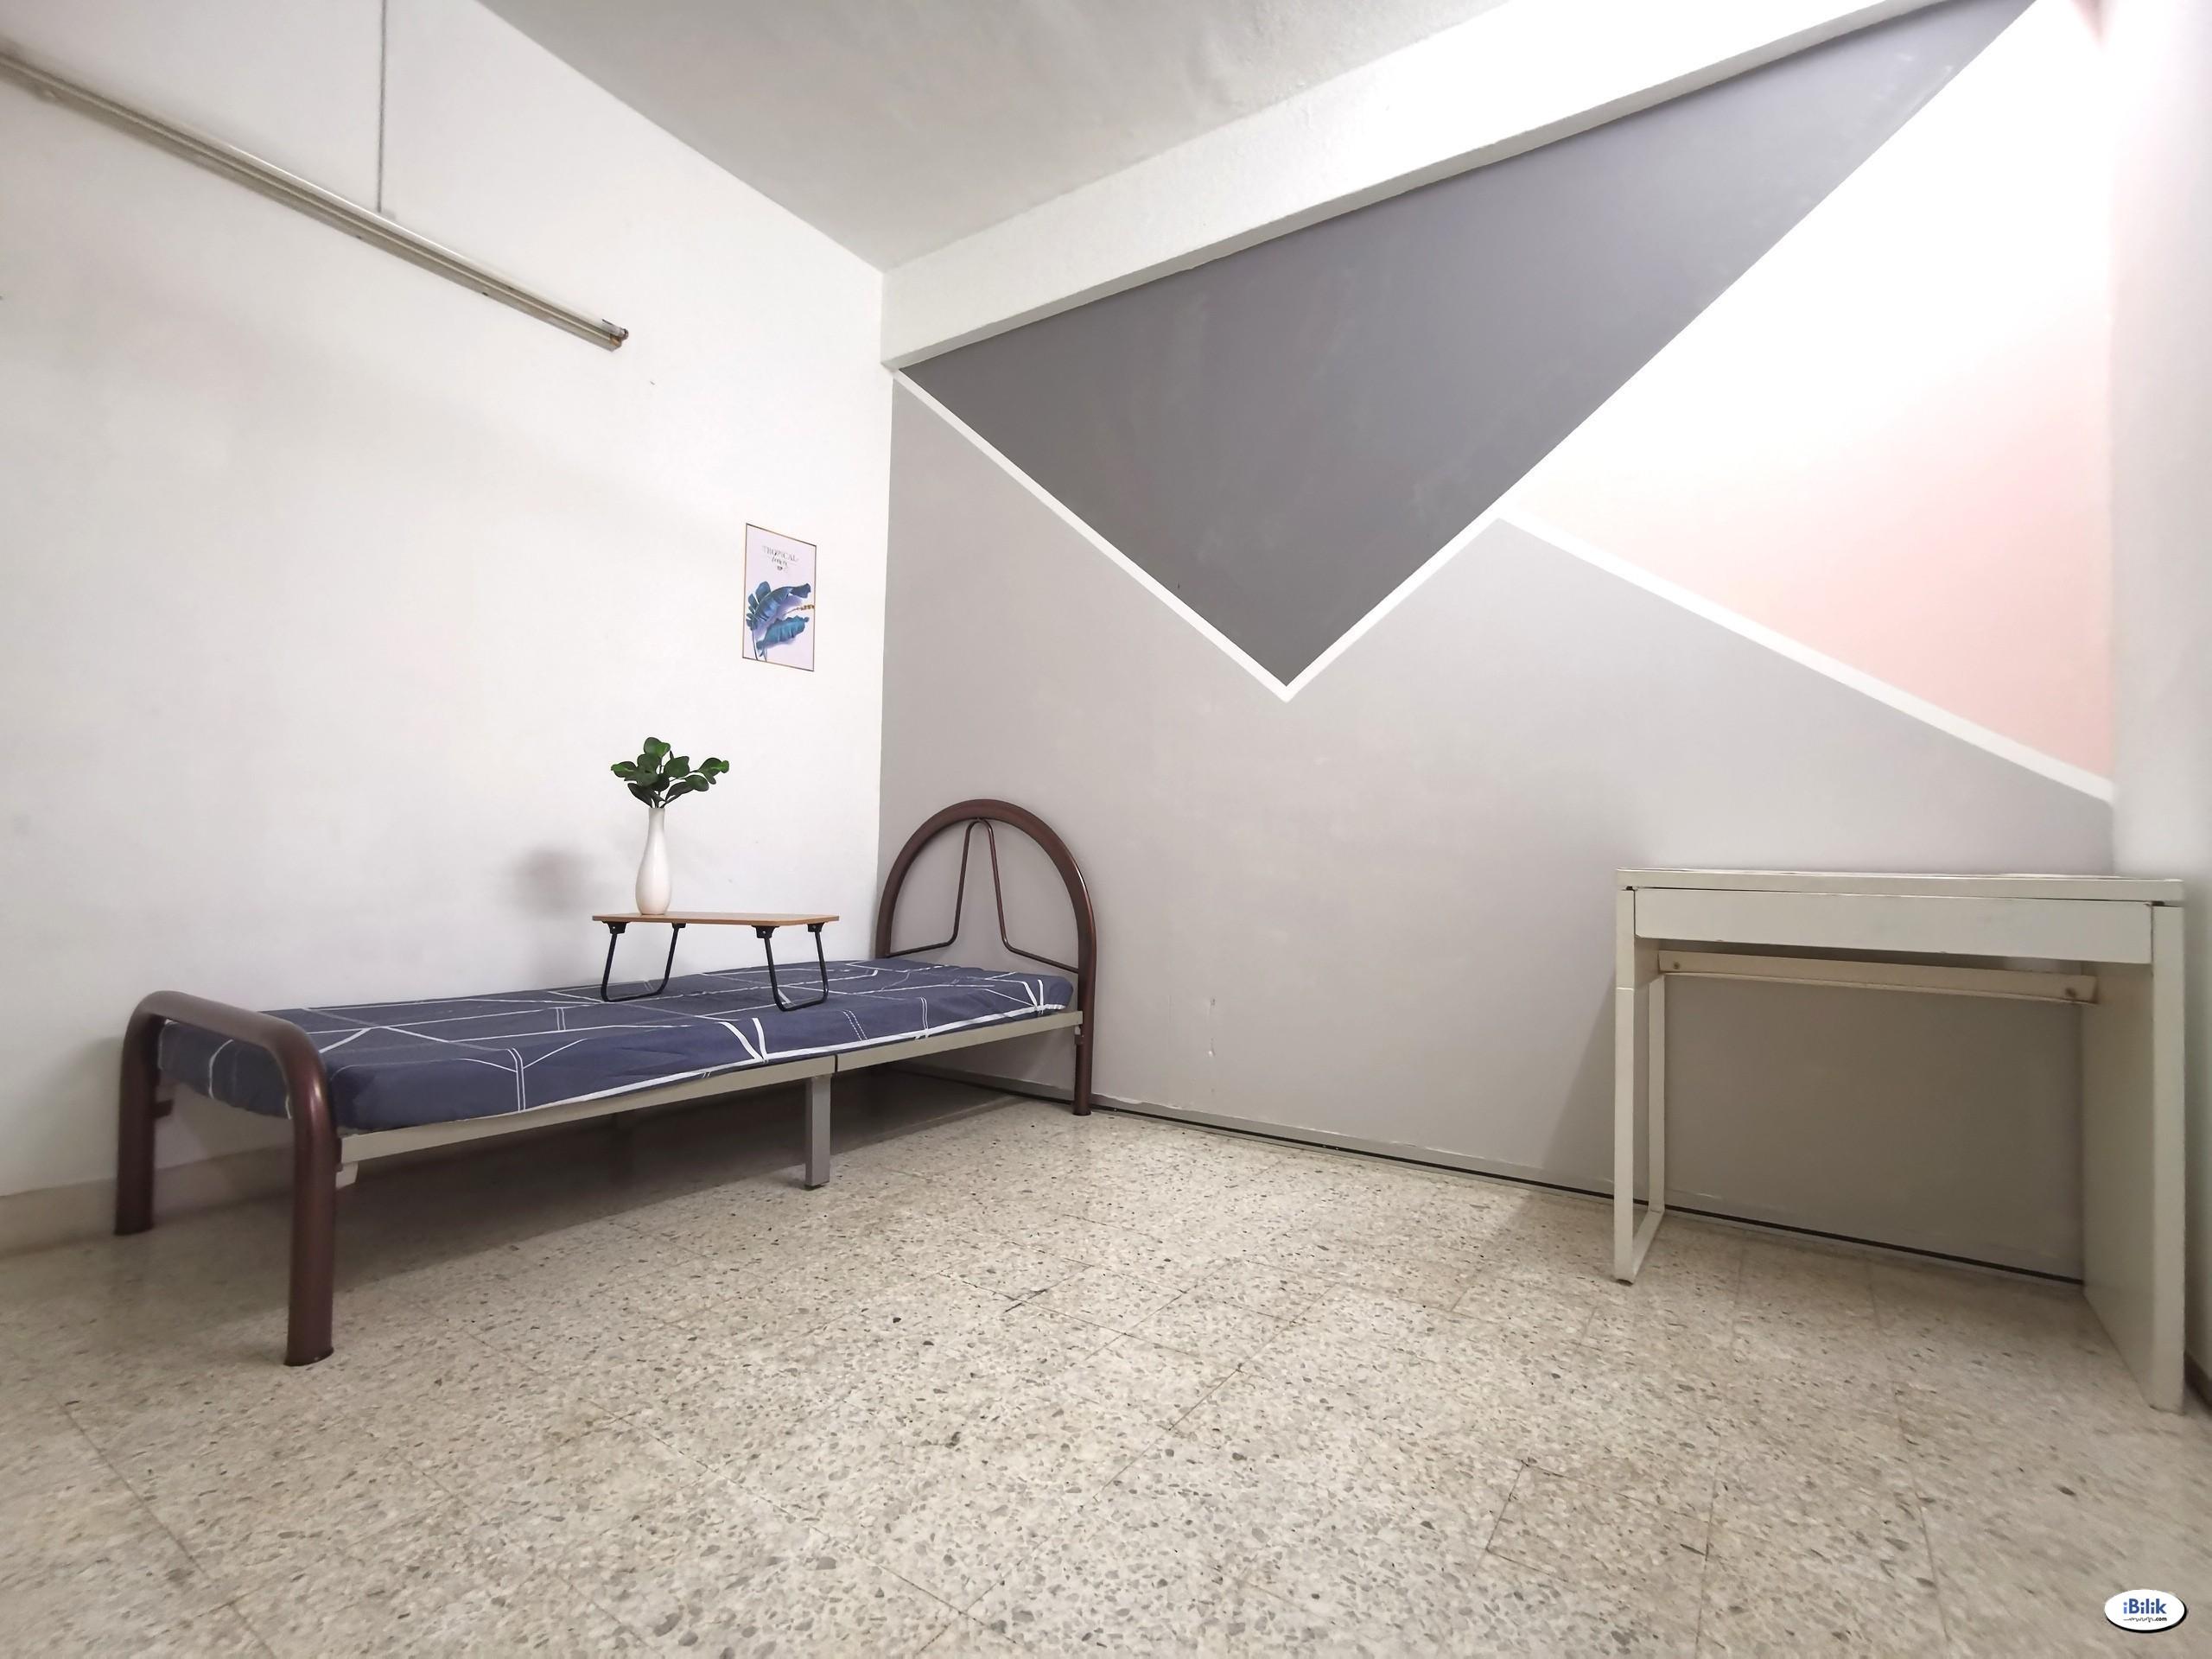 Single Room at BU10, Bandar Utama Near Centre Point Bandar Utama / Glomac Berhad